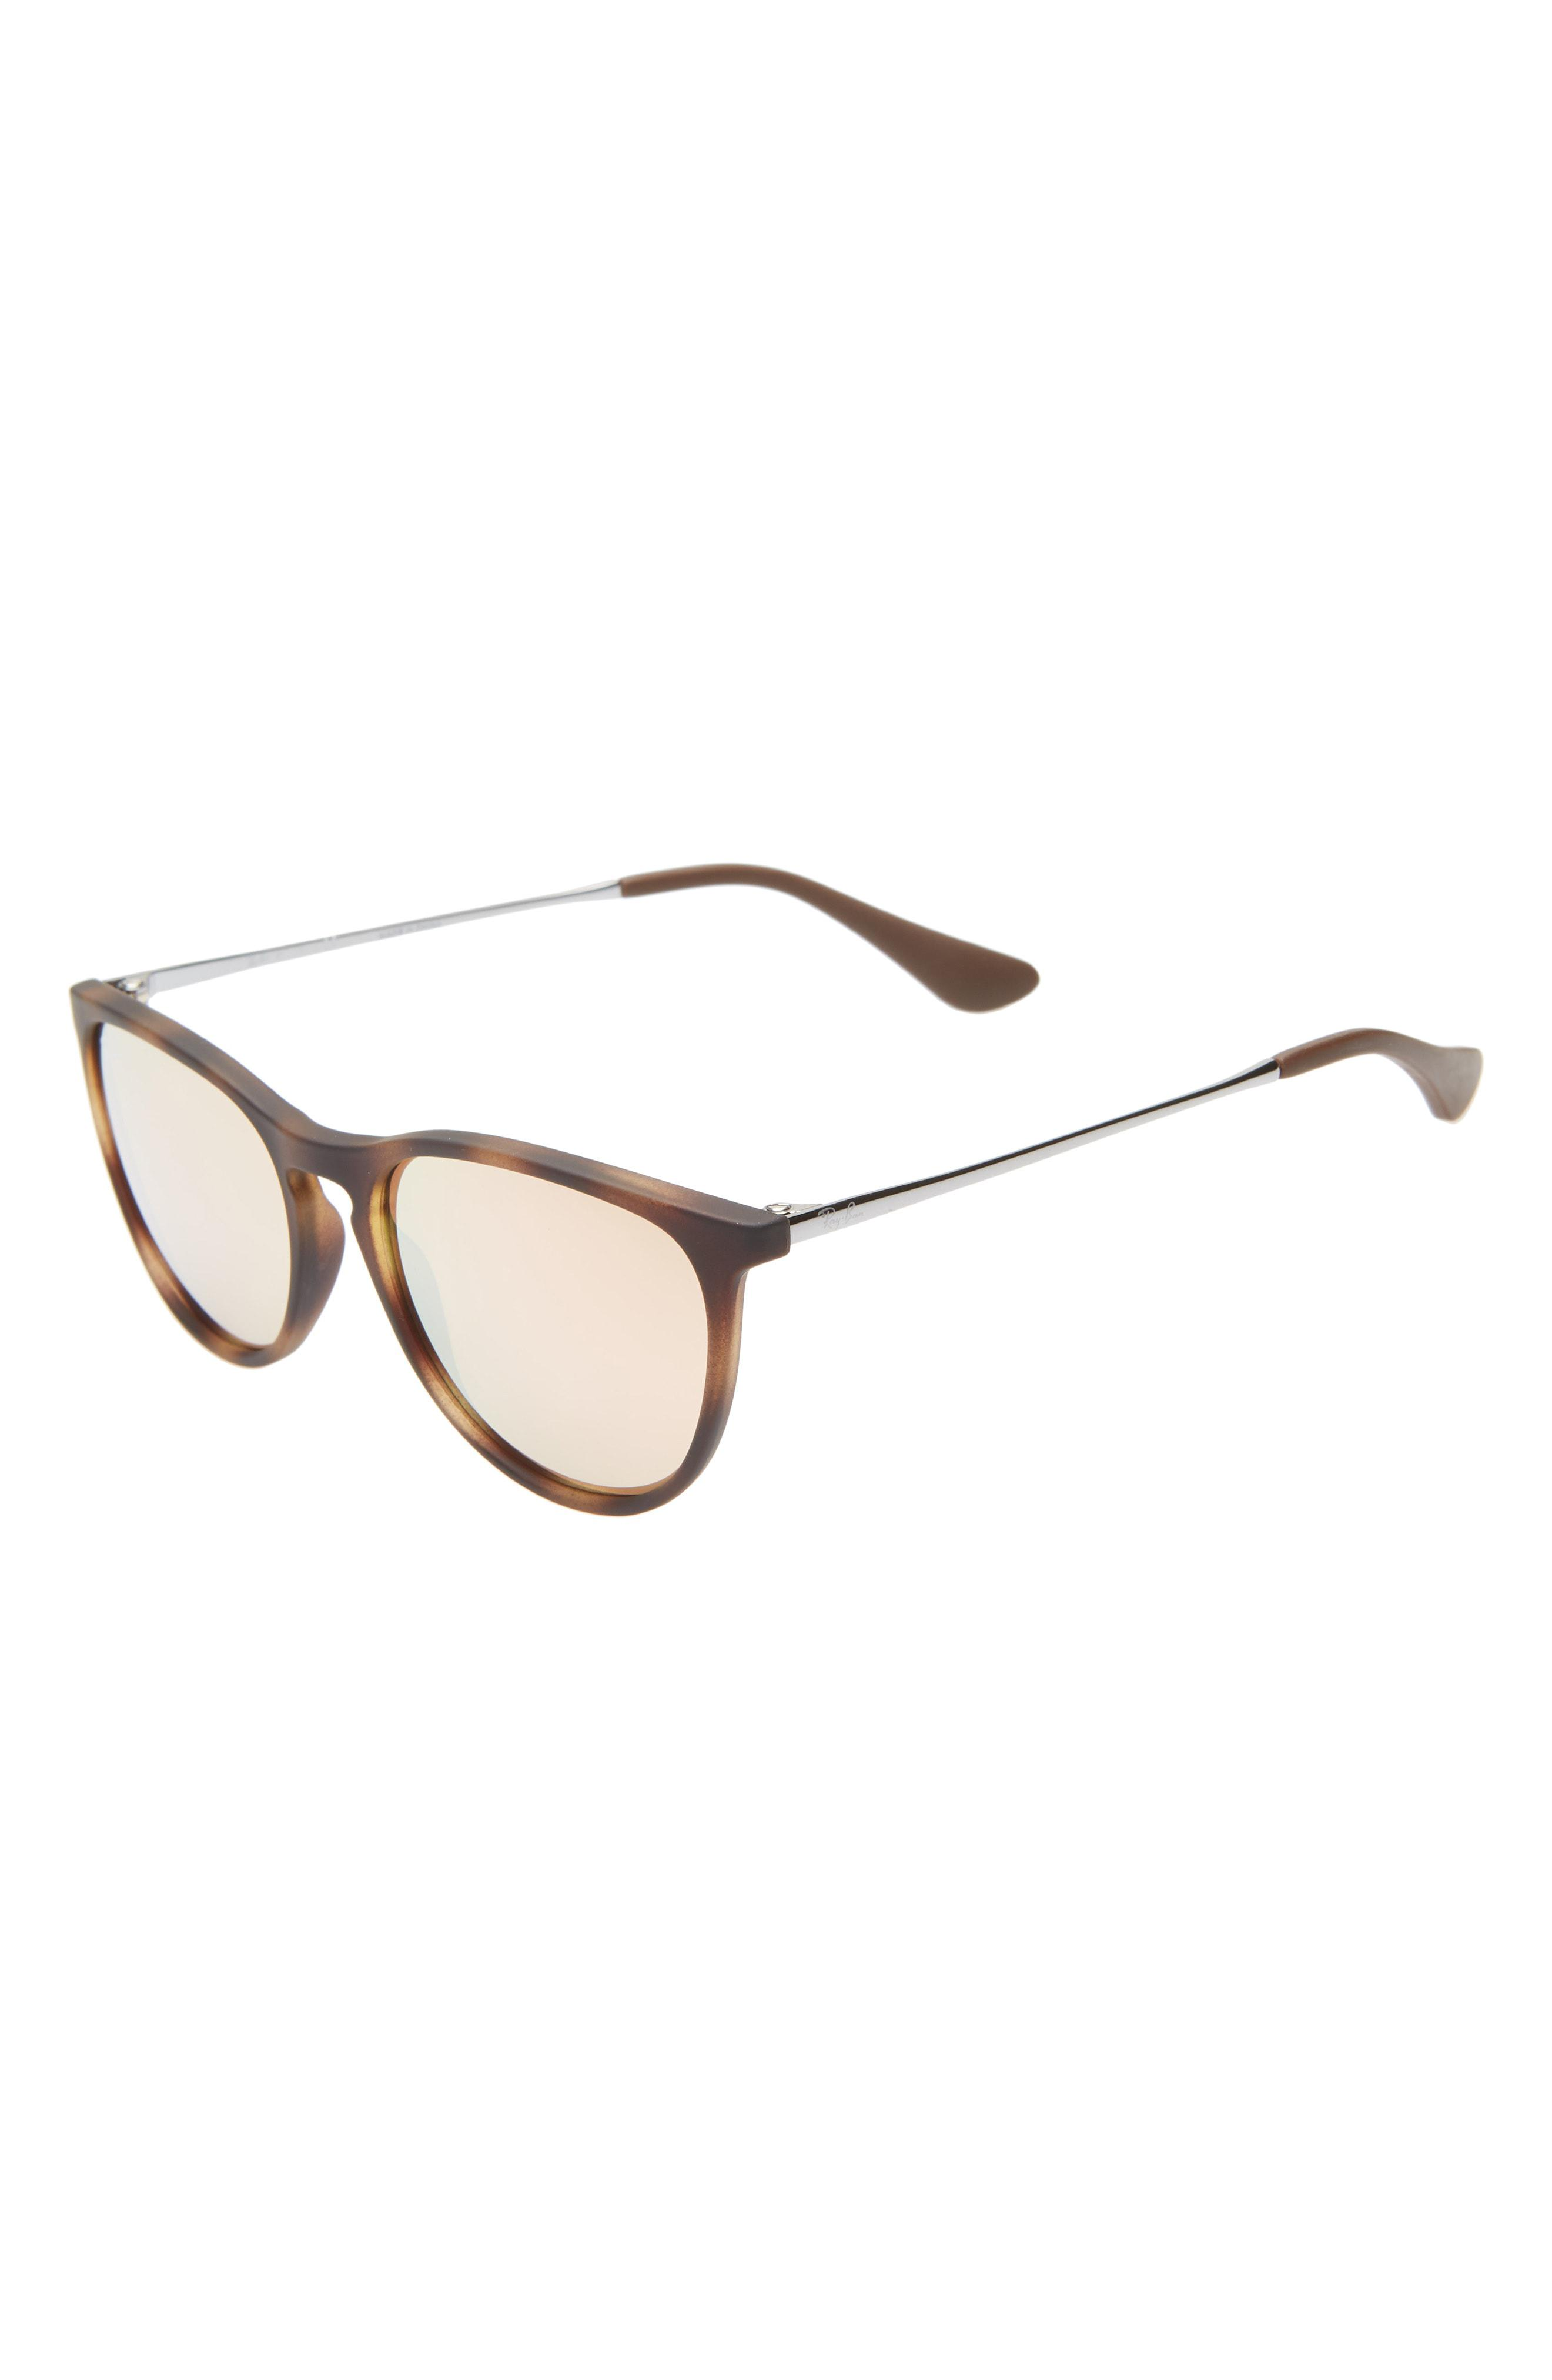 97508f0601e1 Ray-Ban Ray-bay Junior Izzy 50mm Mirrored Sunglasses - Lyst